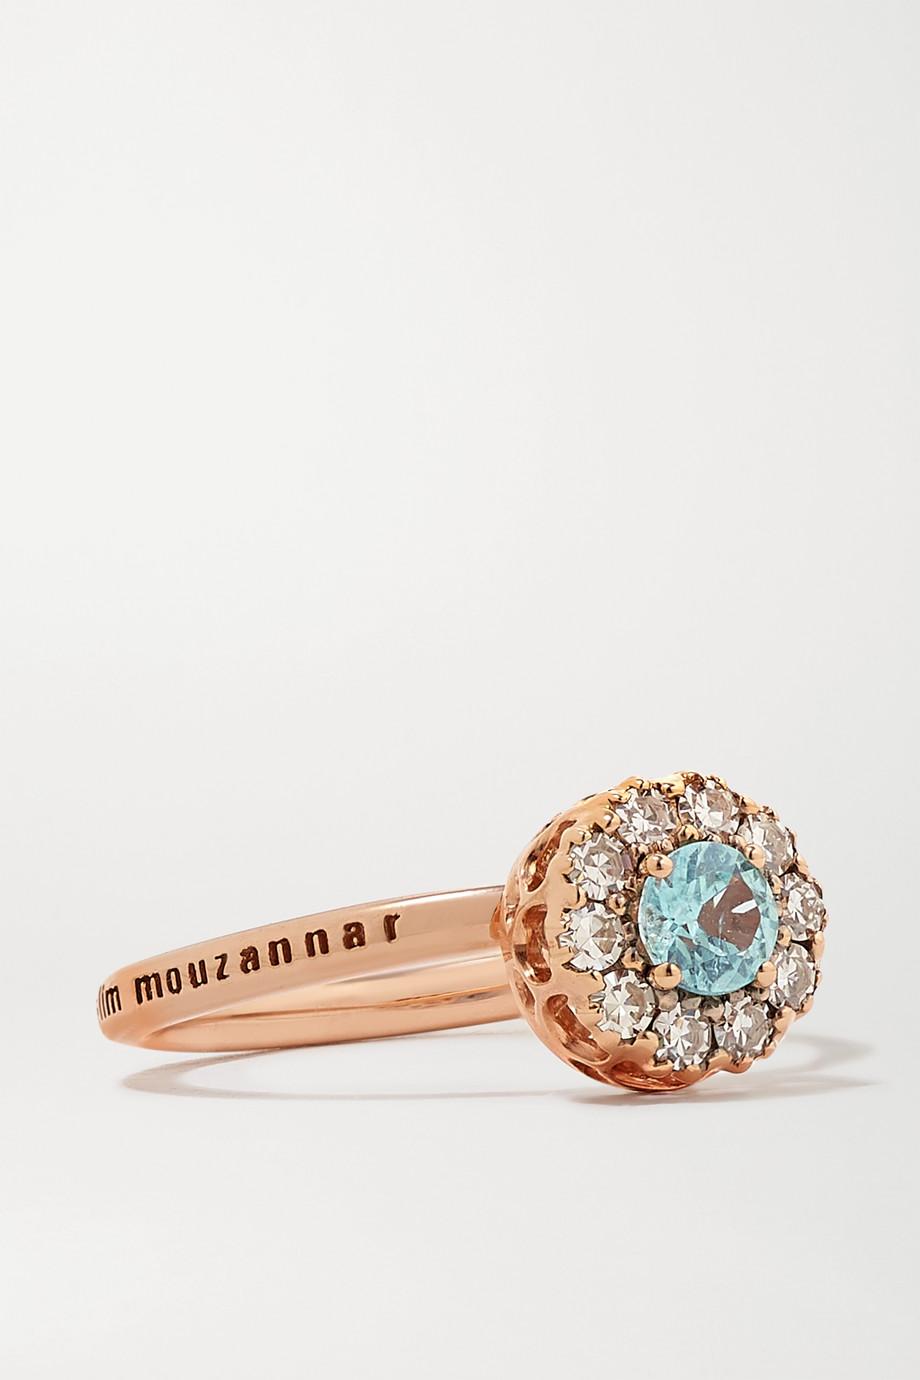 Selim Mouzannar Beirut Basic 18-karat rose gold, paraiba and diamond ring